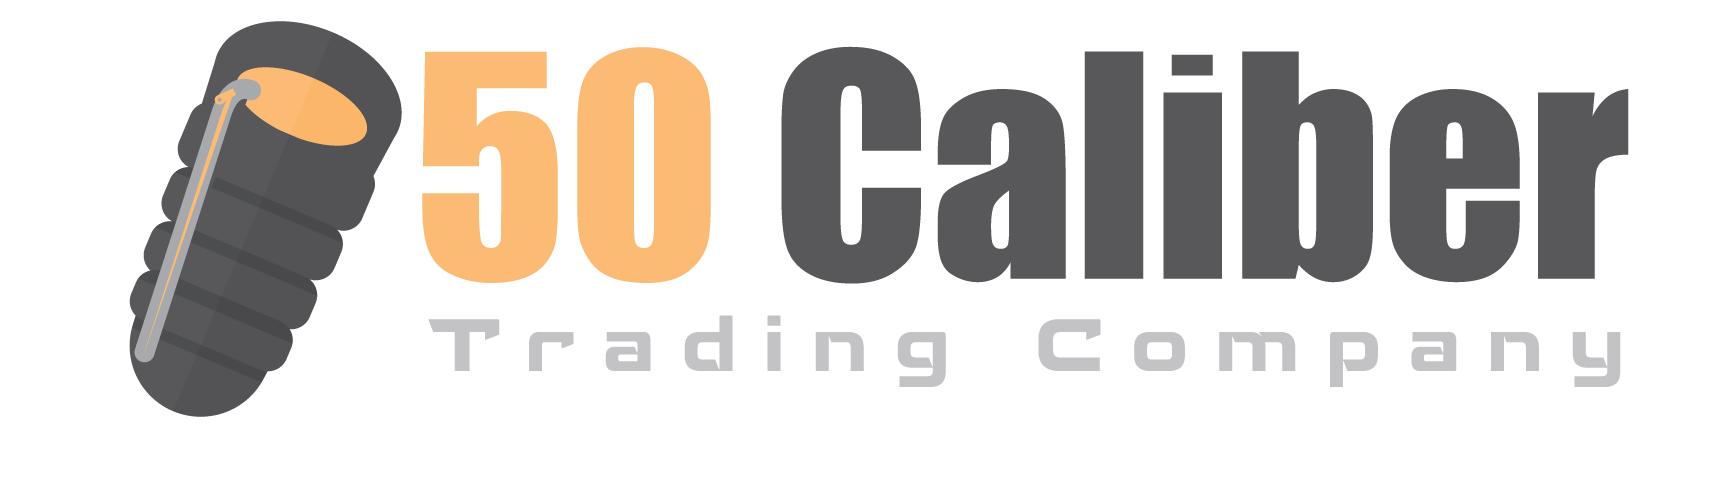 50 Caliber Trading Company